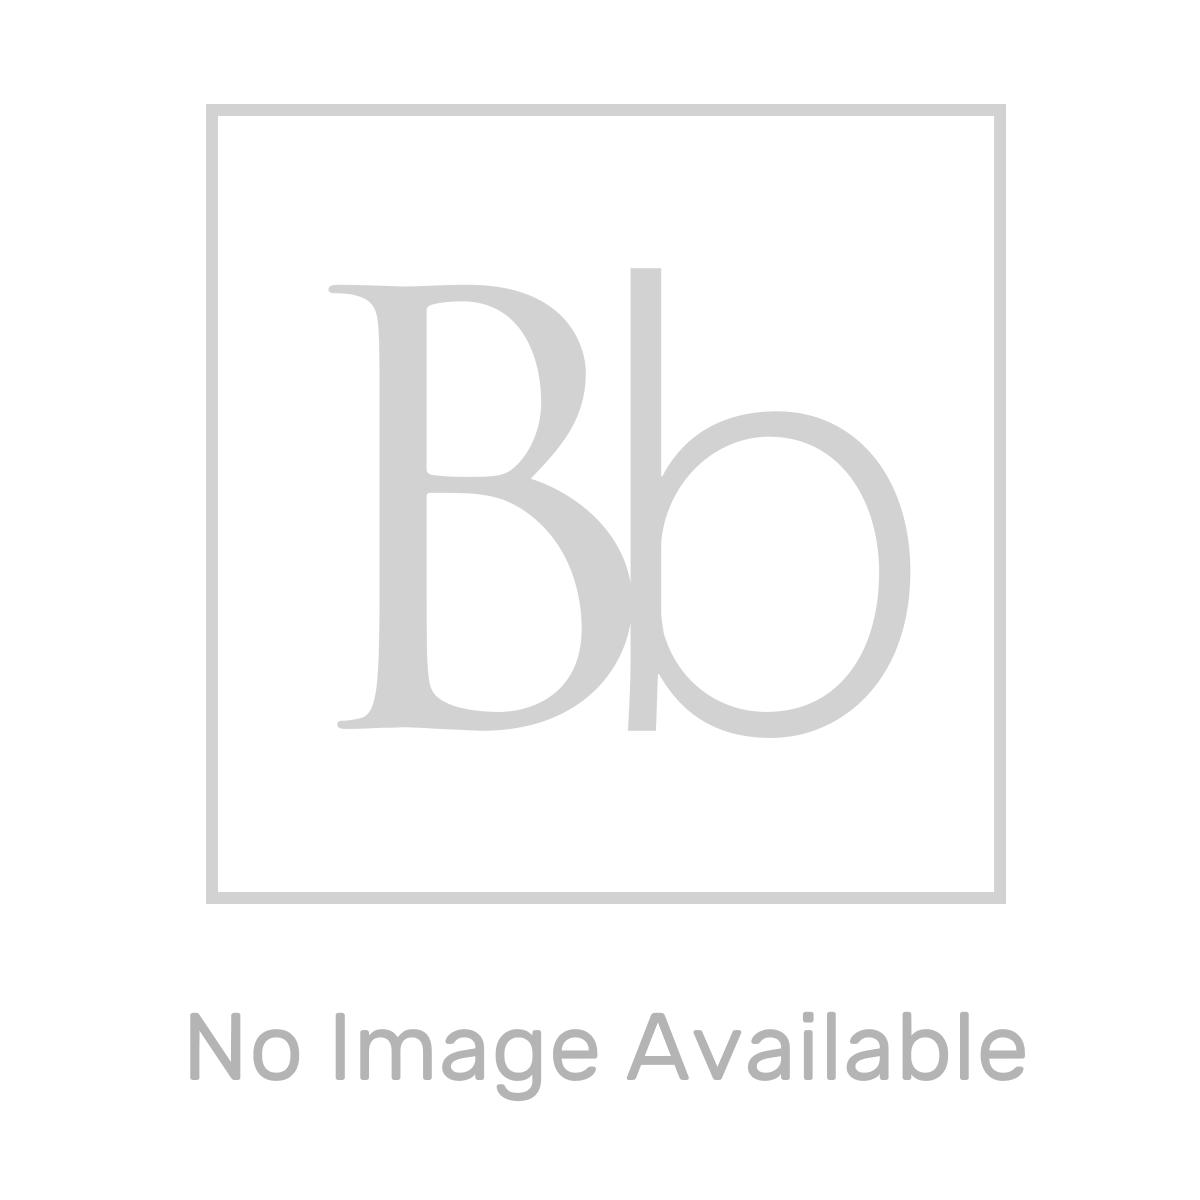 Frontline Alex Designer Heated Towel Rail 1580 x 500mm Dimensions